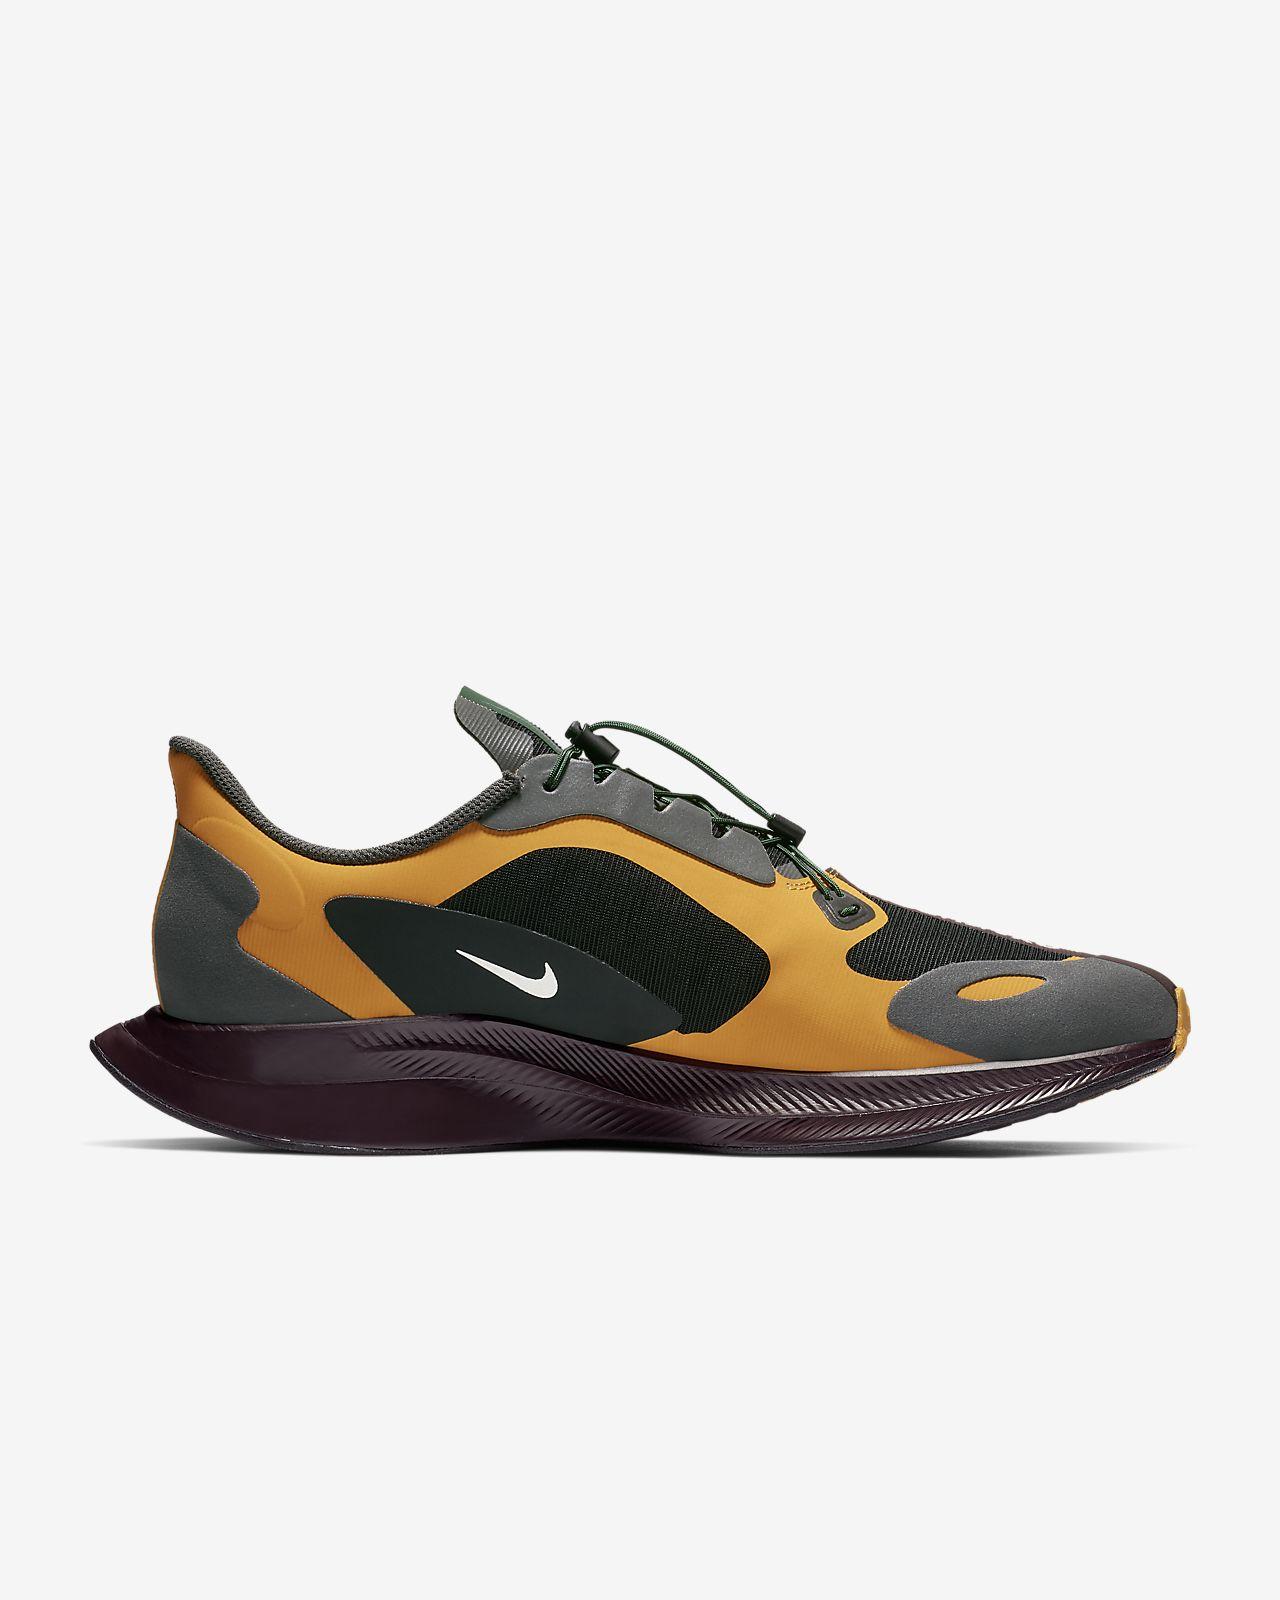 6fe24a7df0b6 Nike Gyakusou Zoom Pegasus 35 Turbo Men s Shoe. Nike.com